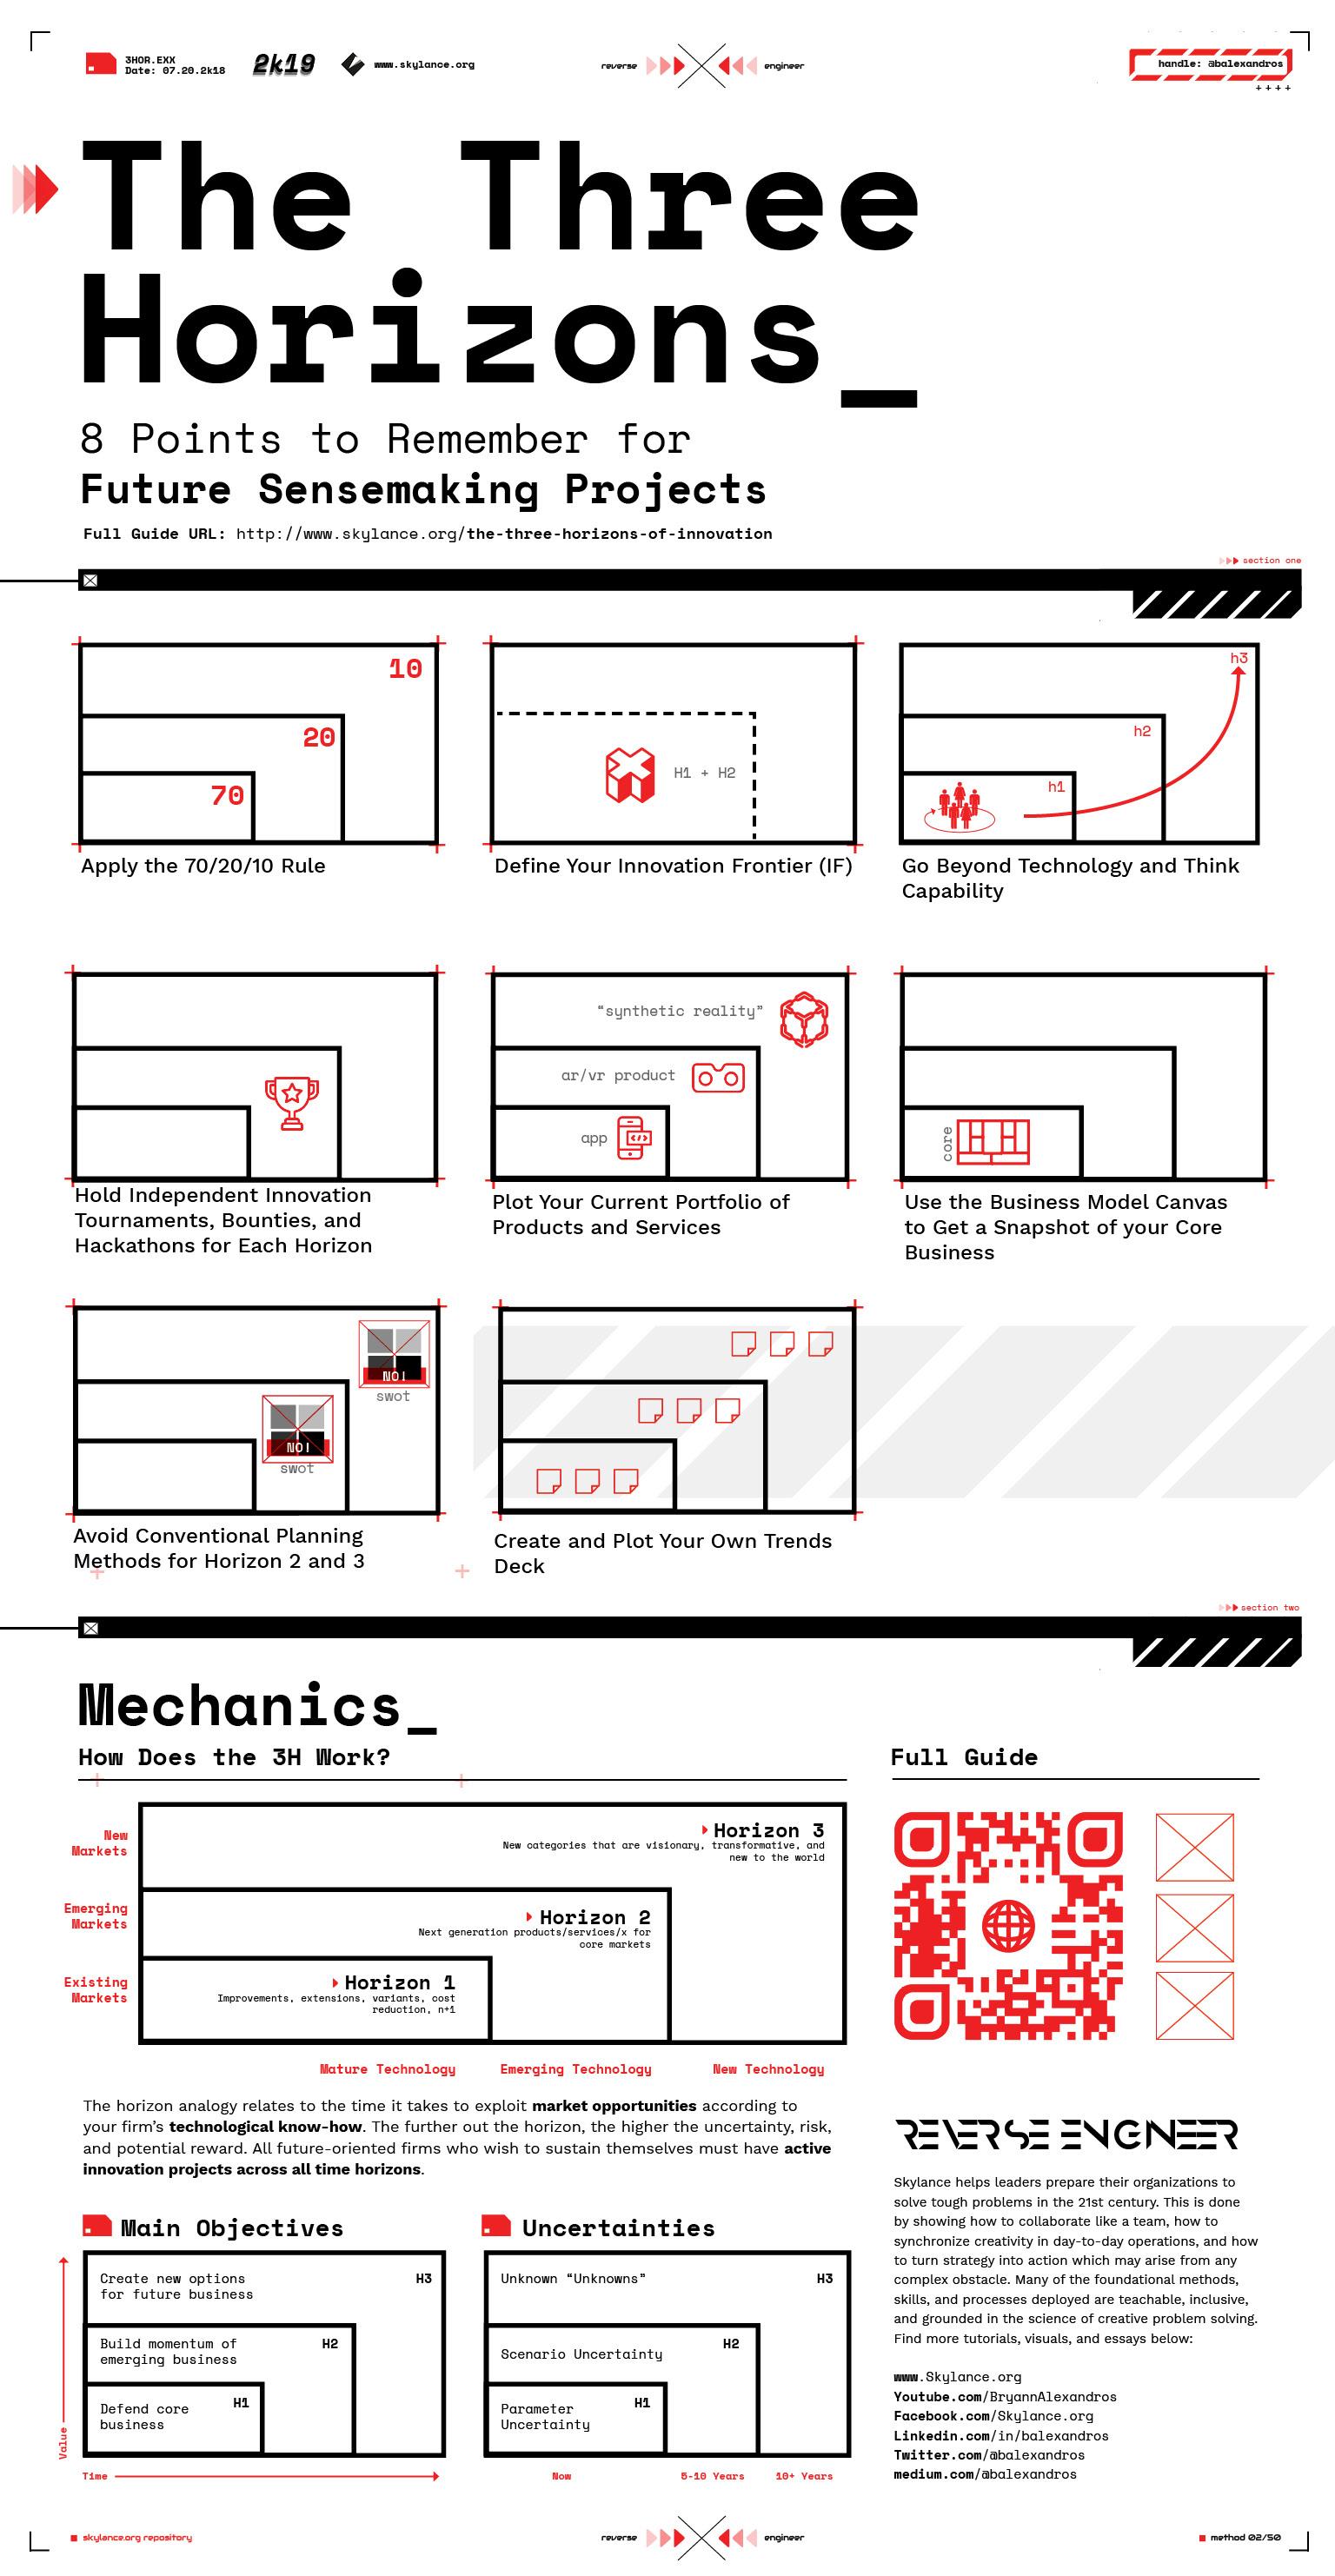 3-horizons-infographic-black-linkedin-version.jpg